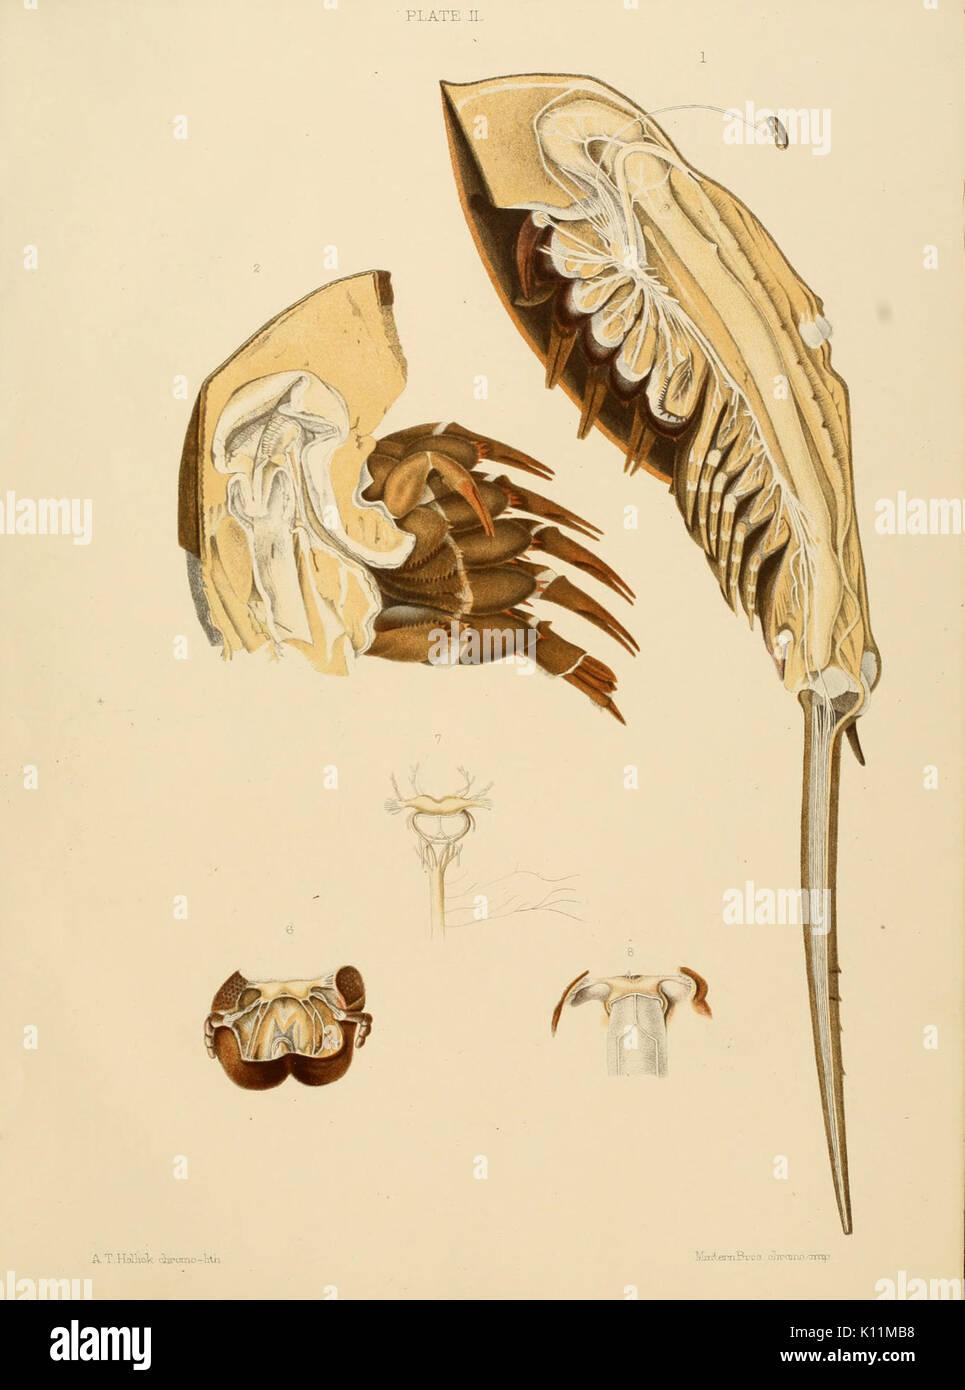 Anatomy of the king crab (Limulus polyphemus, Latr.) (Plate II Stock ...